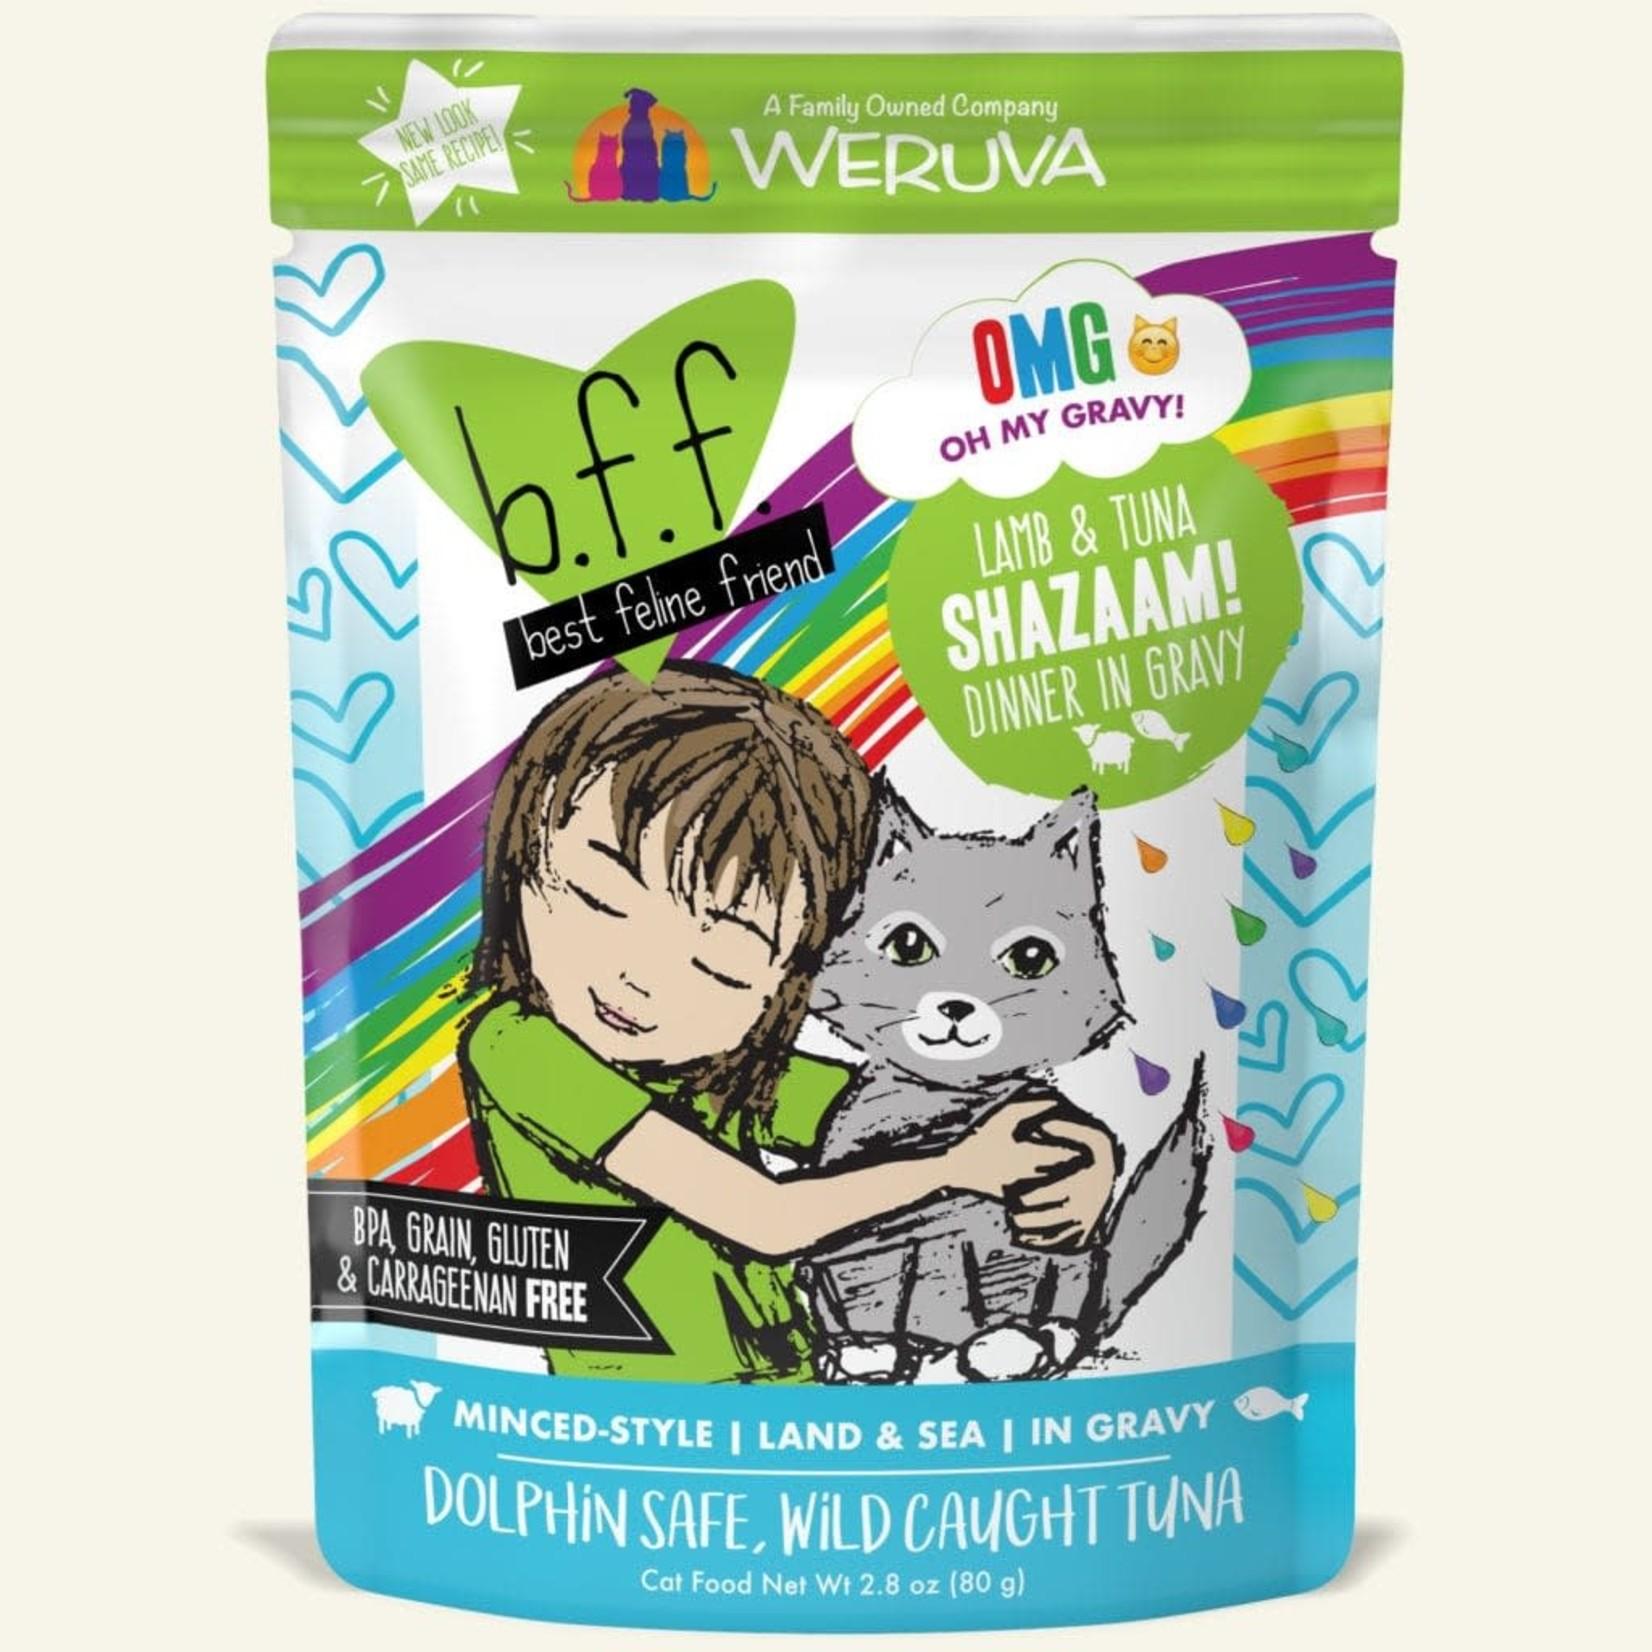 Weruva BFF OMG Cat Lamb & Tuna Shazaam 2.8 OZ Pouch